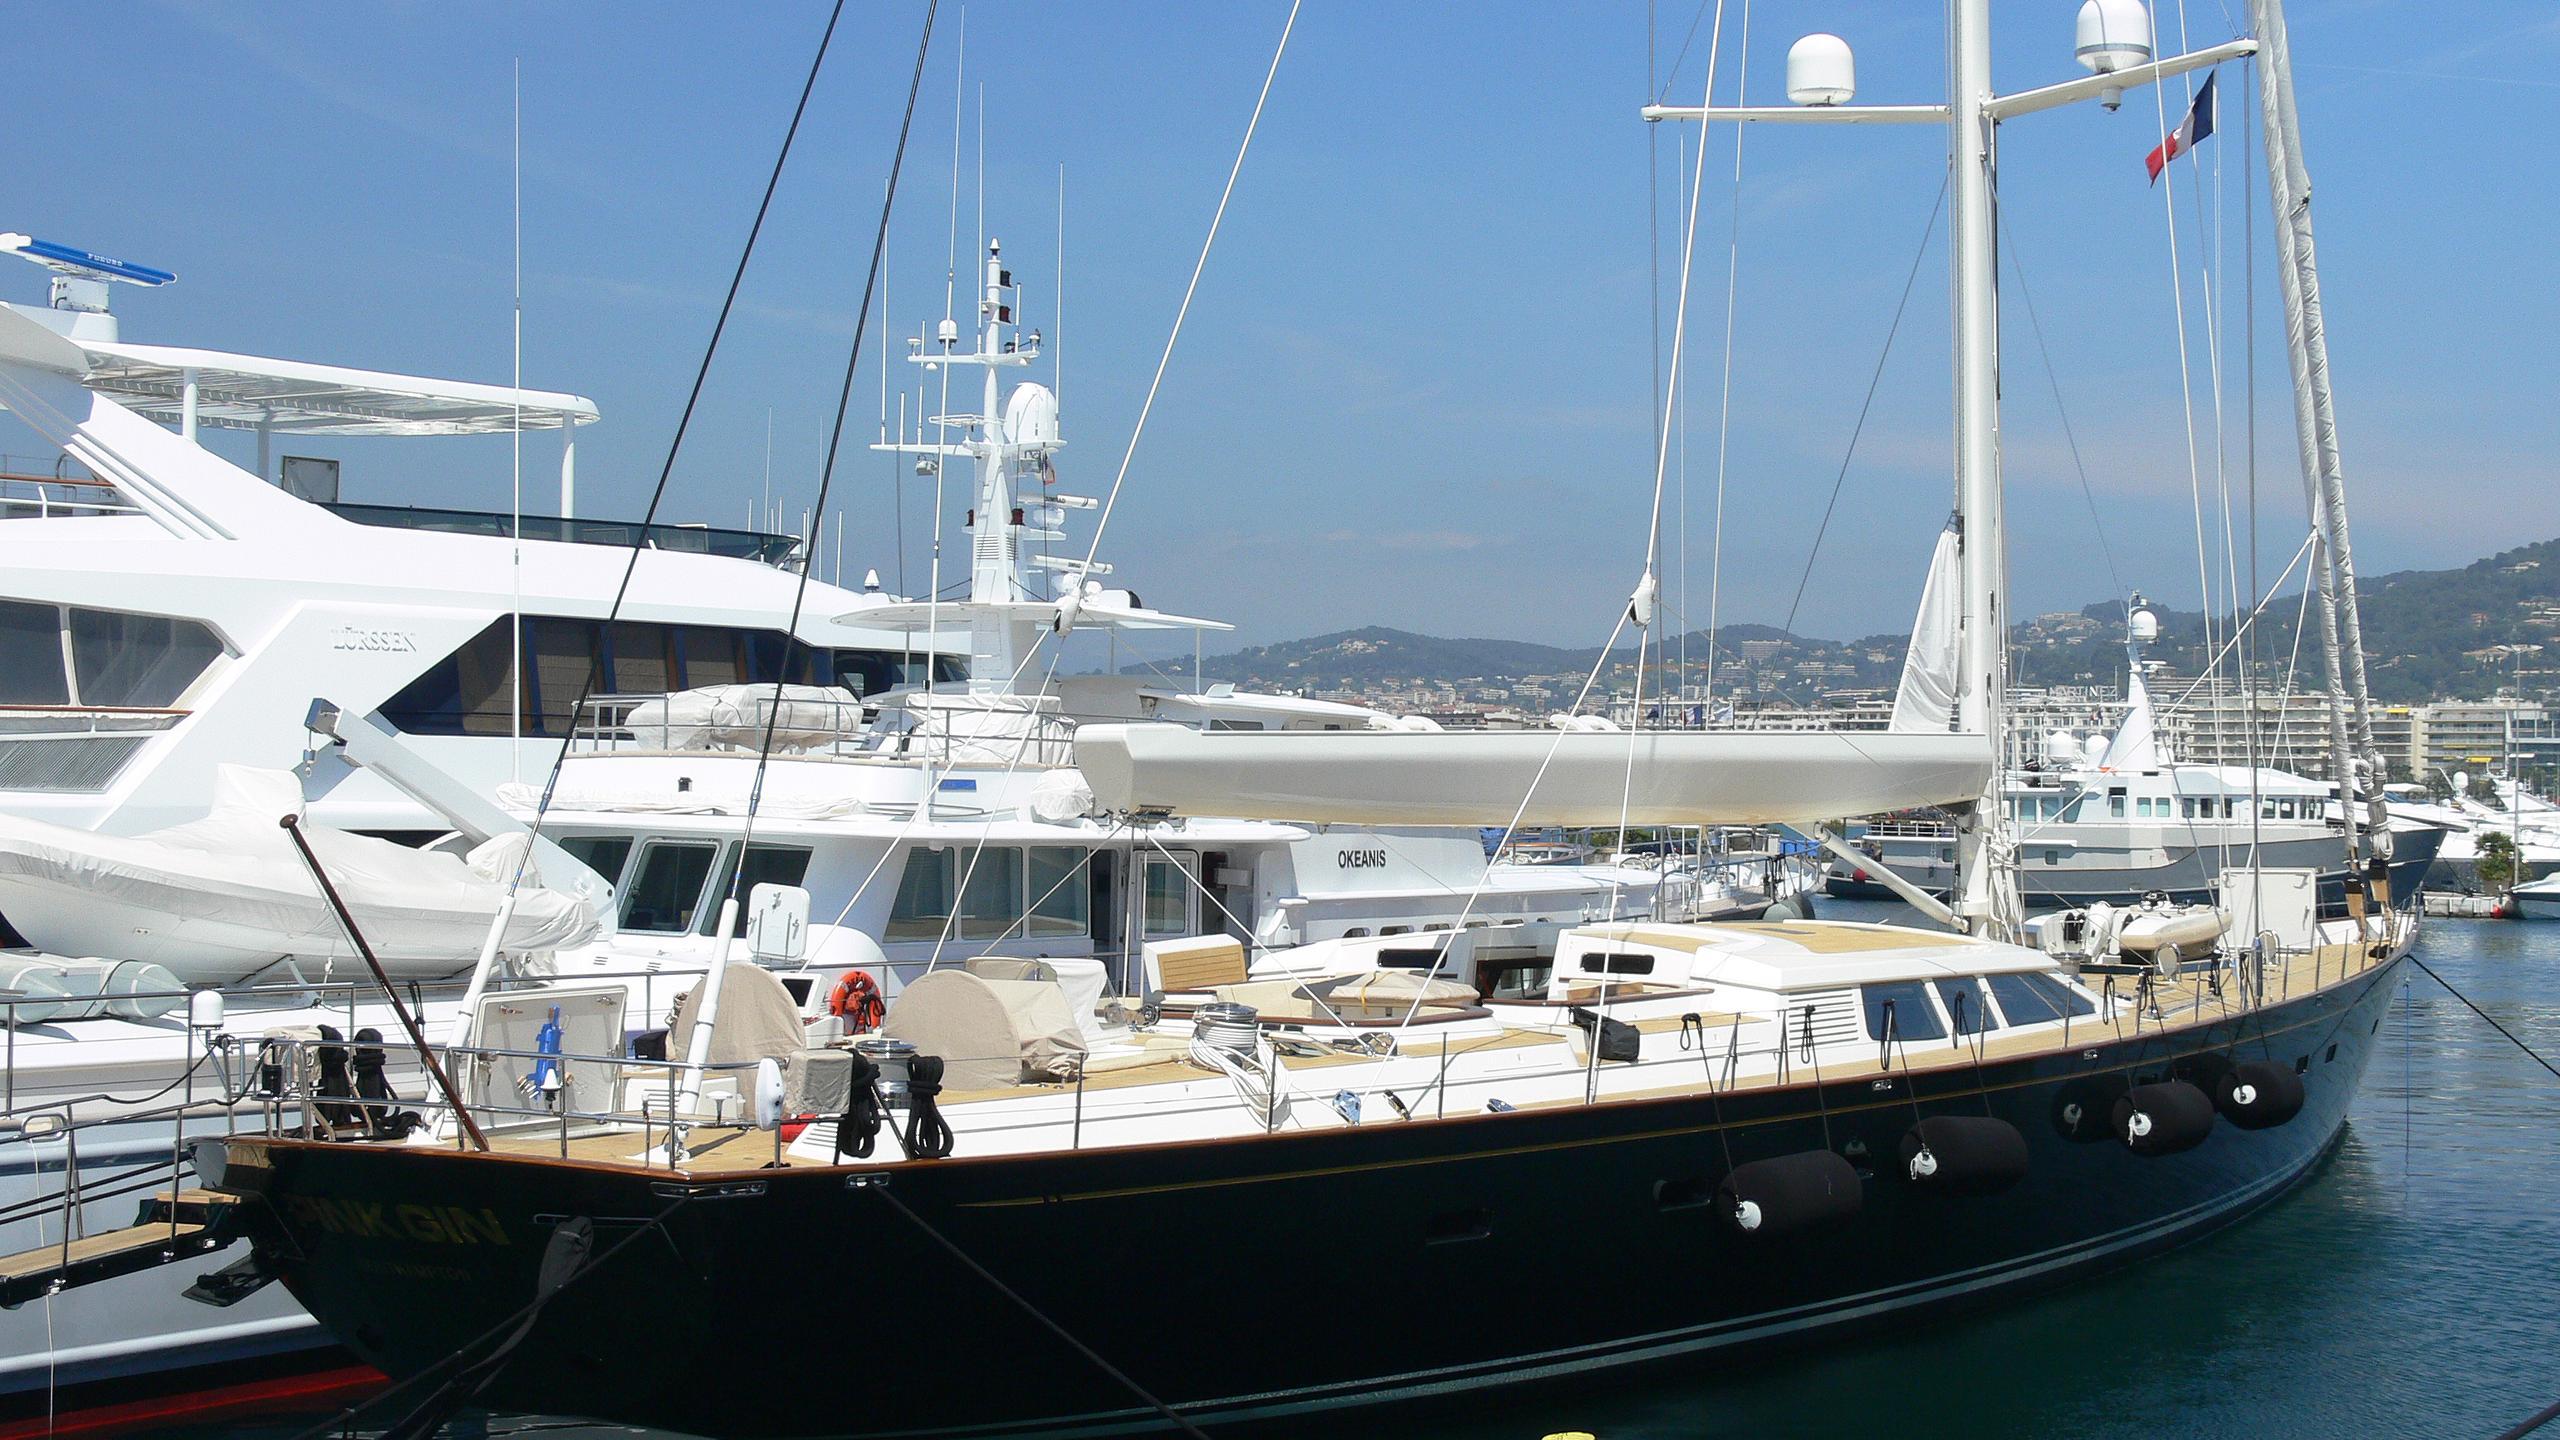 scorpione of london pink gin sailing yacht baltic yachts 46m 2006 half stern